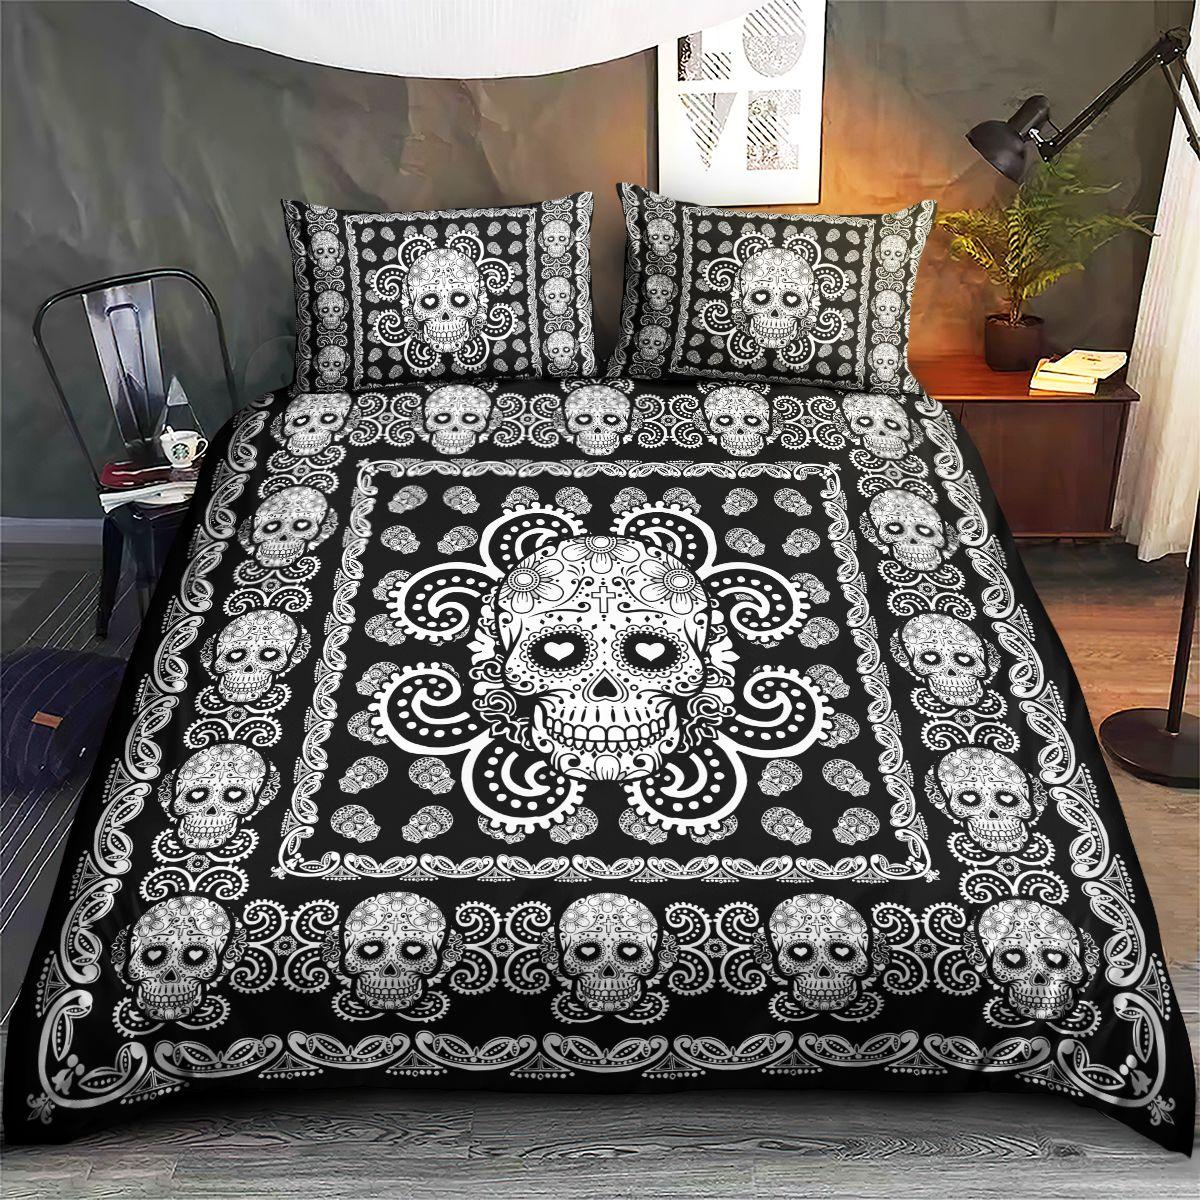 Sugar Skull Black and White Pattern Premium Bedding Set